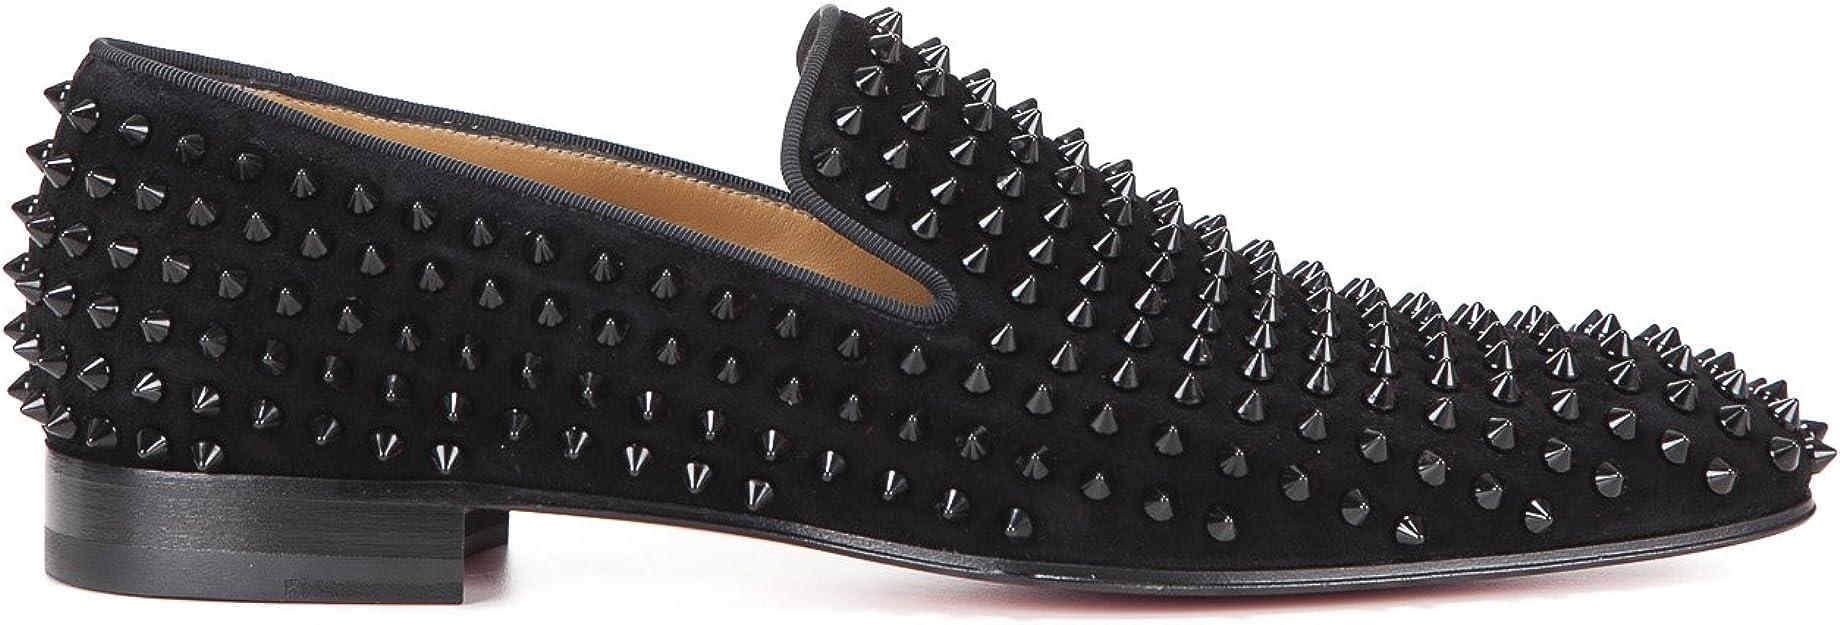 boutique louboutin chaussure homme